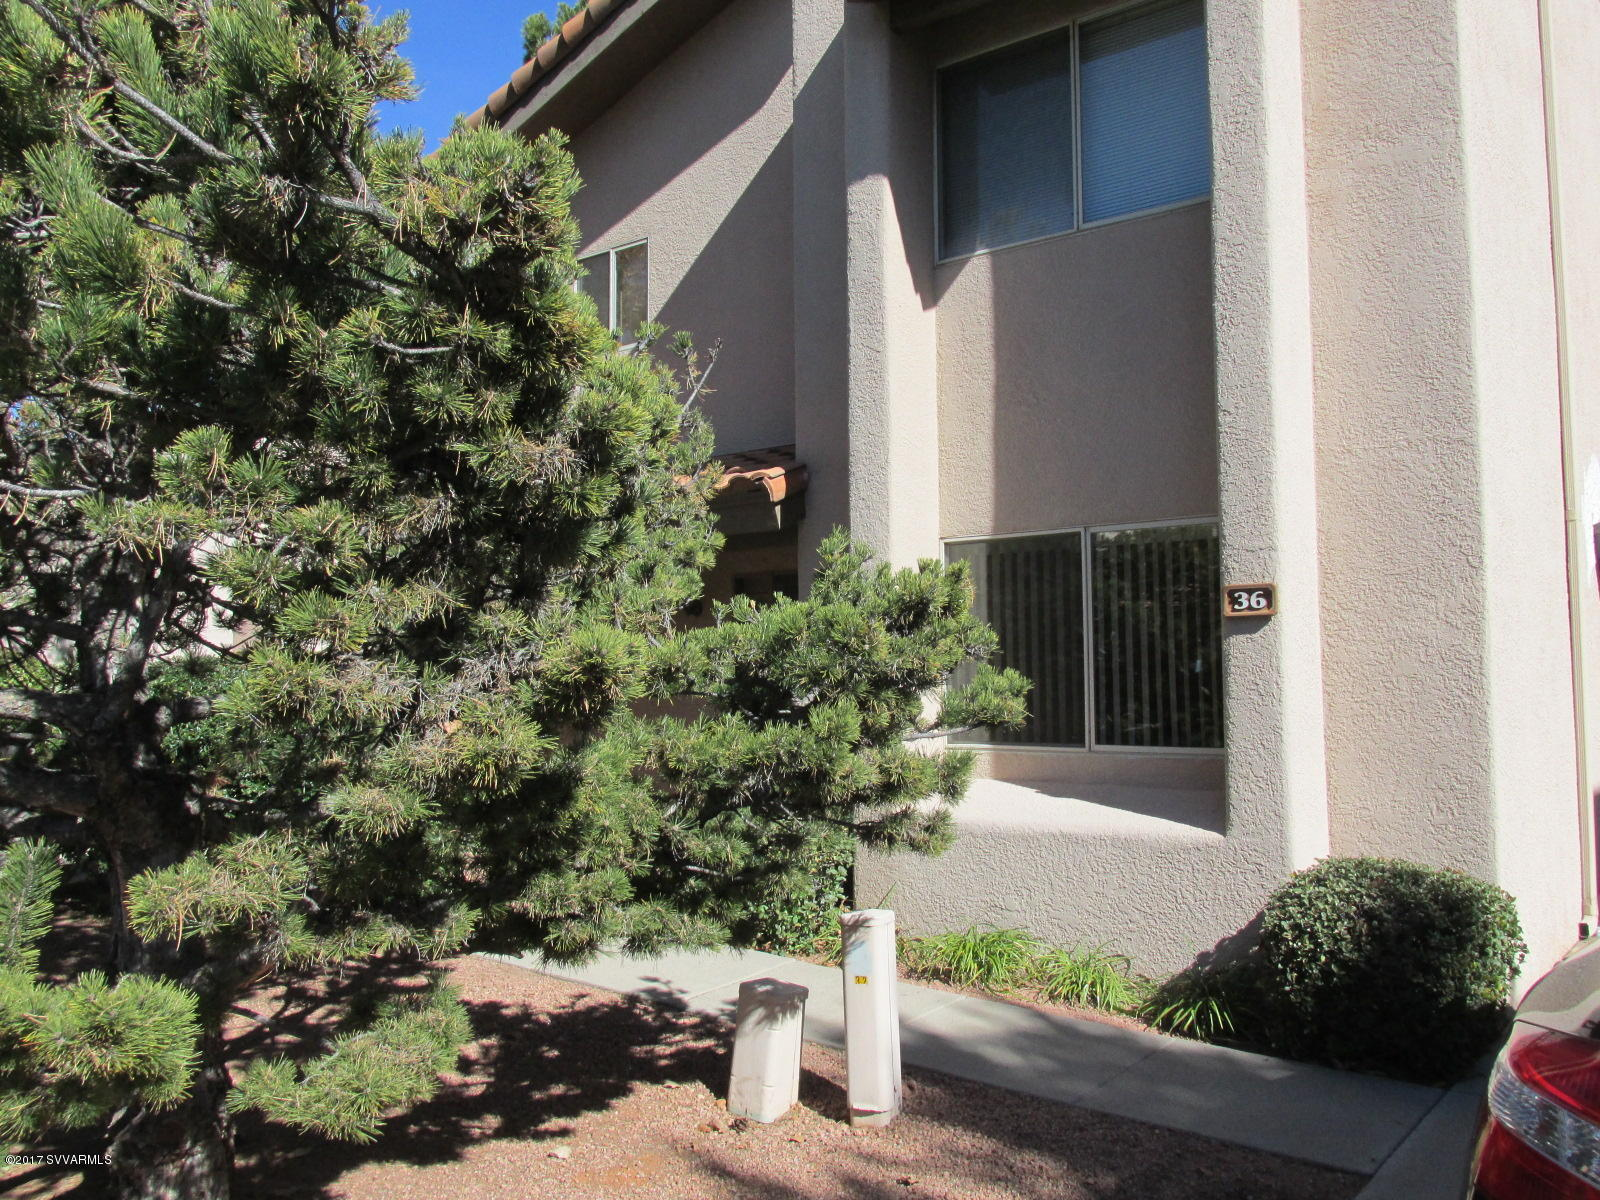 36 Tanager Lane Sedona, AZ 86336